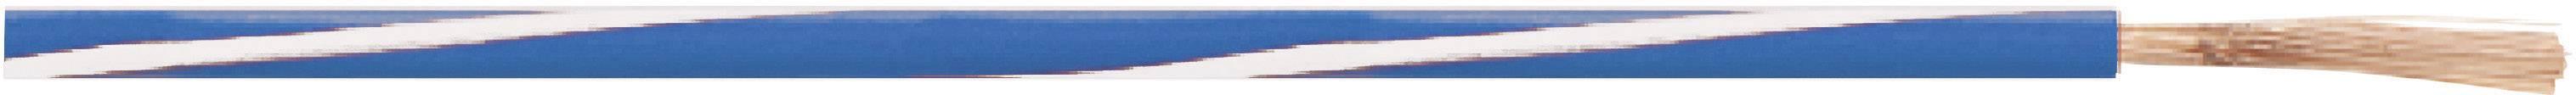 Opletenie / lanko LappKabel 4512433S X05V-K, 1 x 1 mm², vonkajší Ø 2.60 mm, metrový tovar, biela, čierna